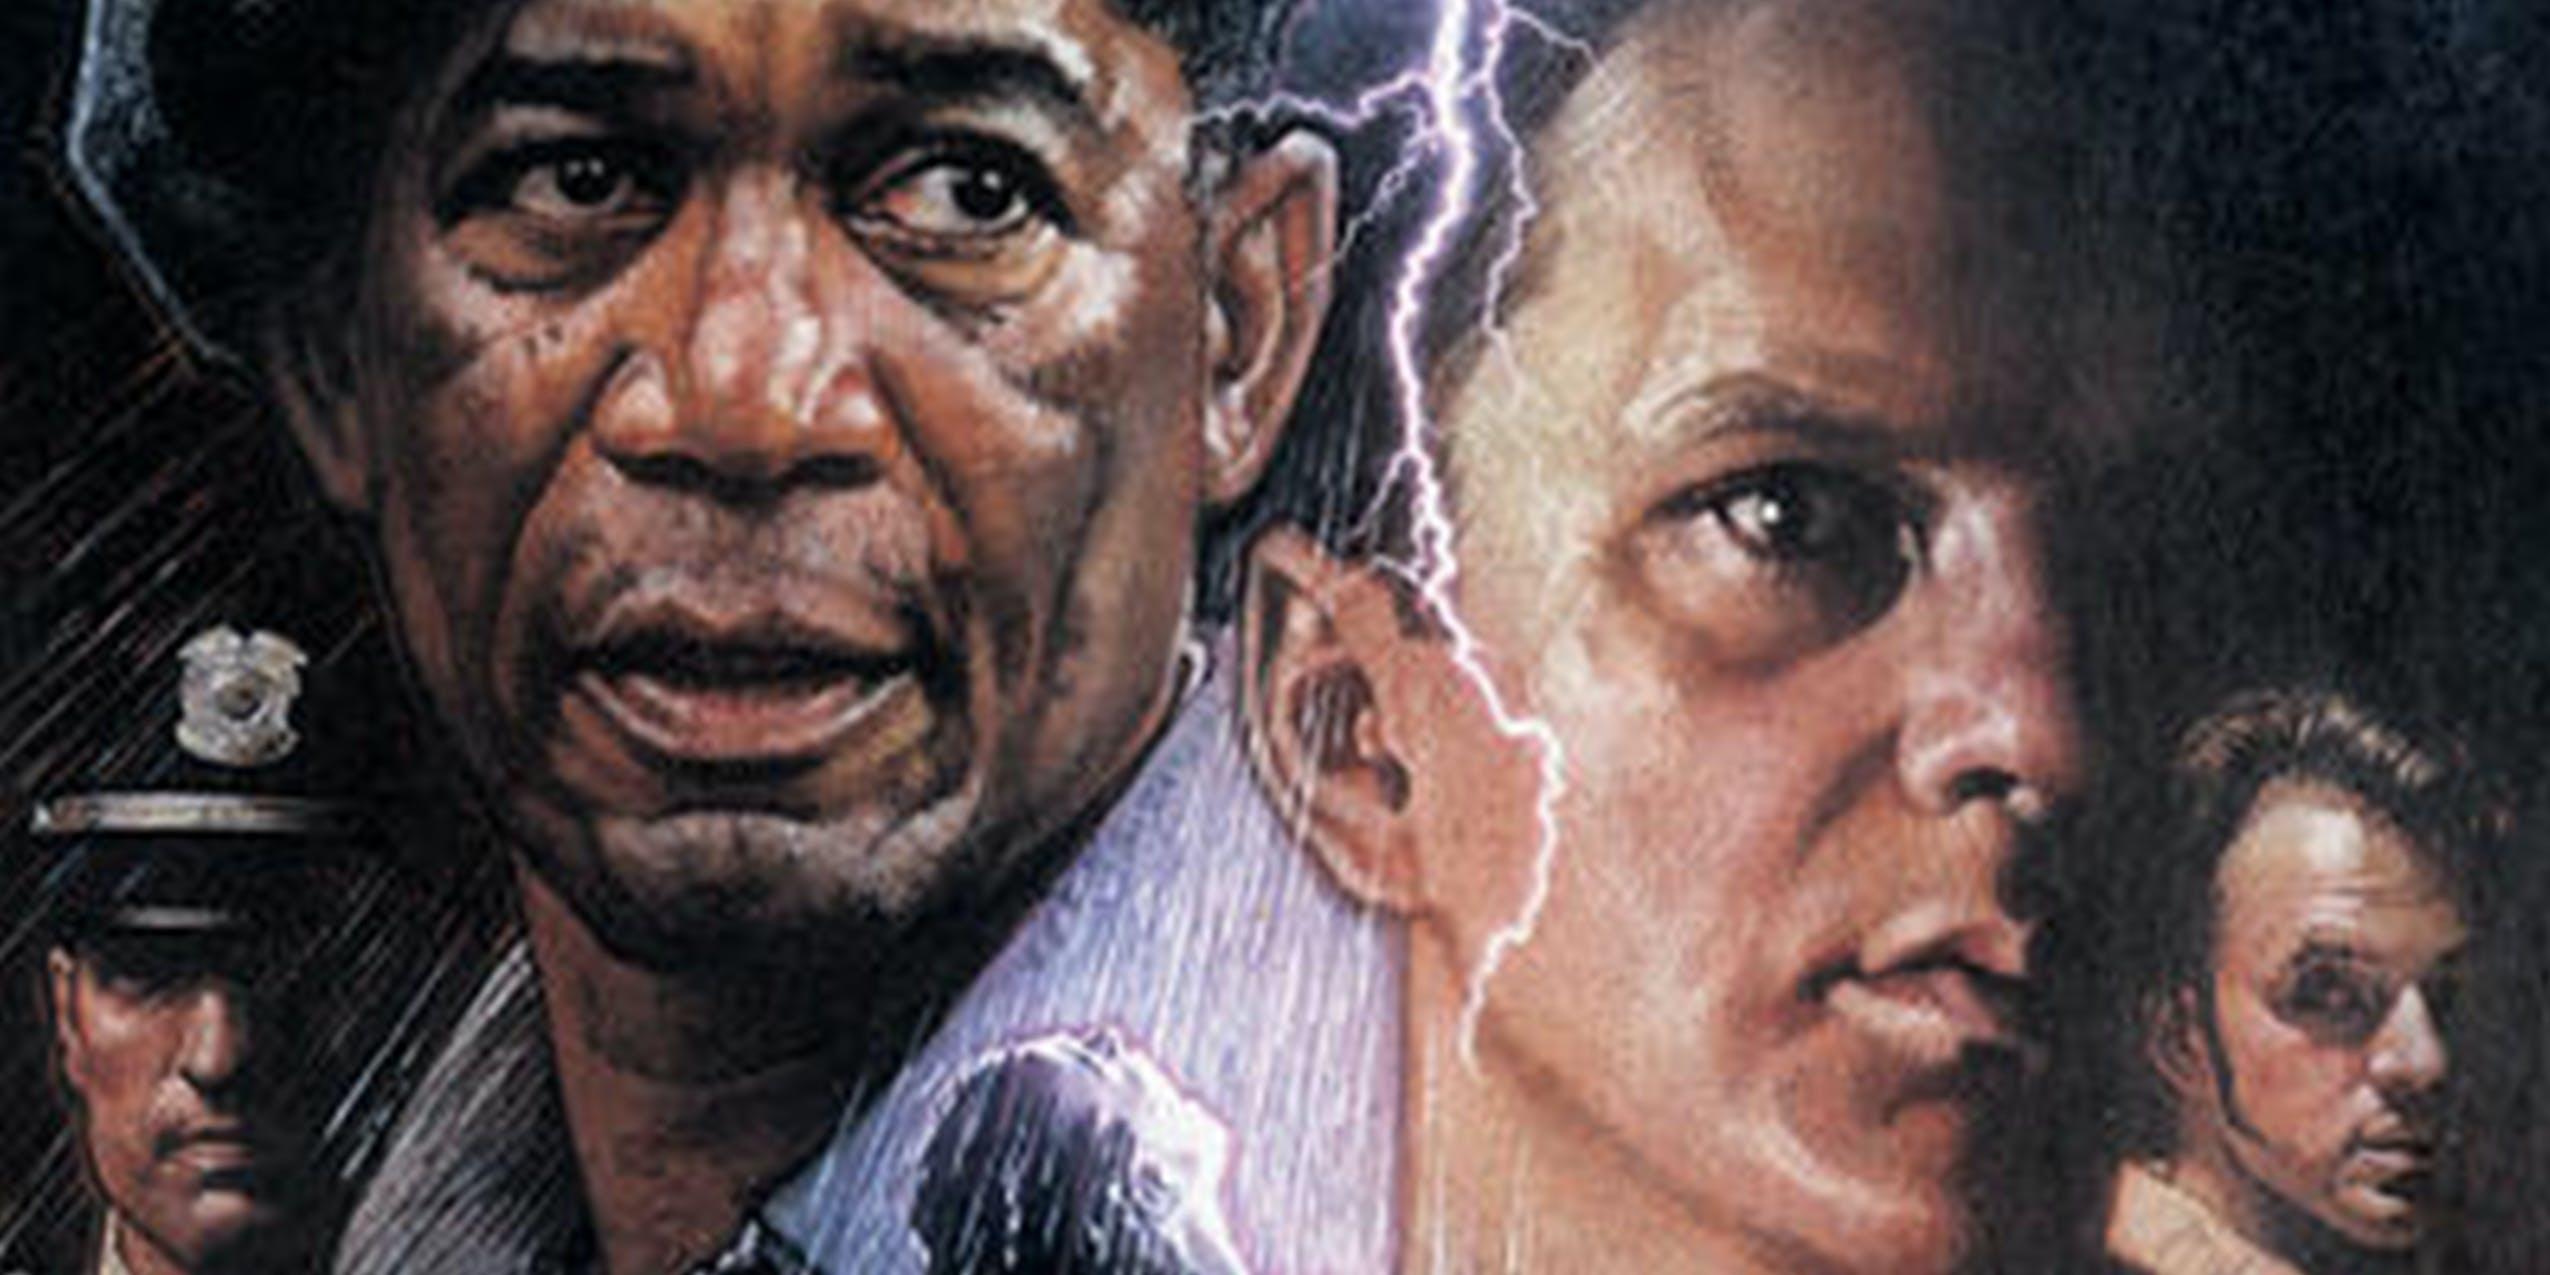 Shawshank Redemption hulu classic movies